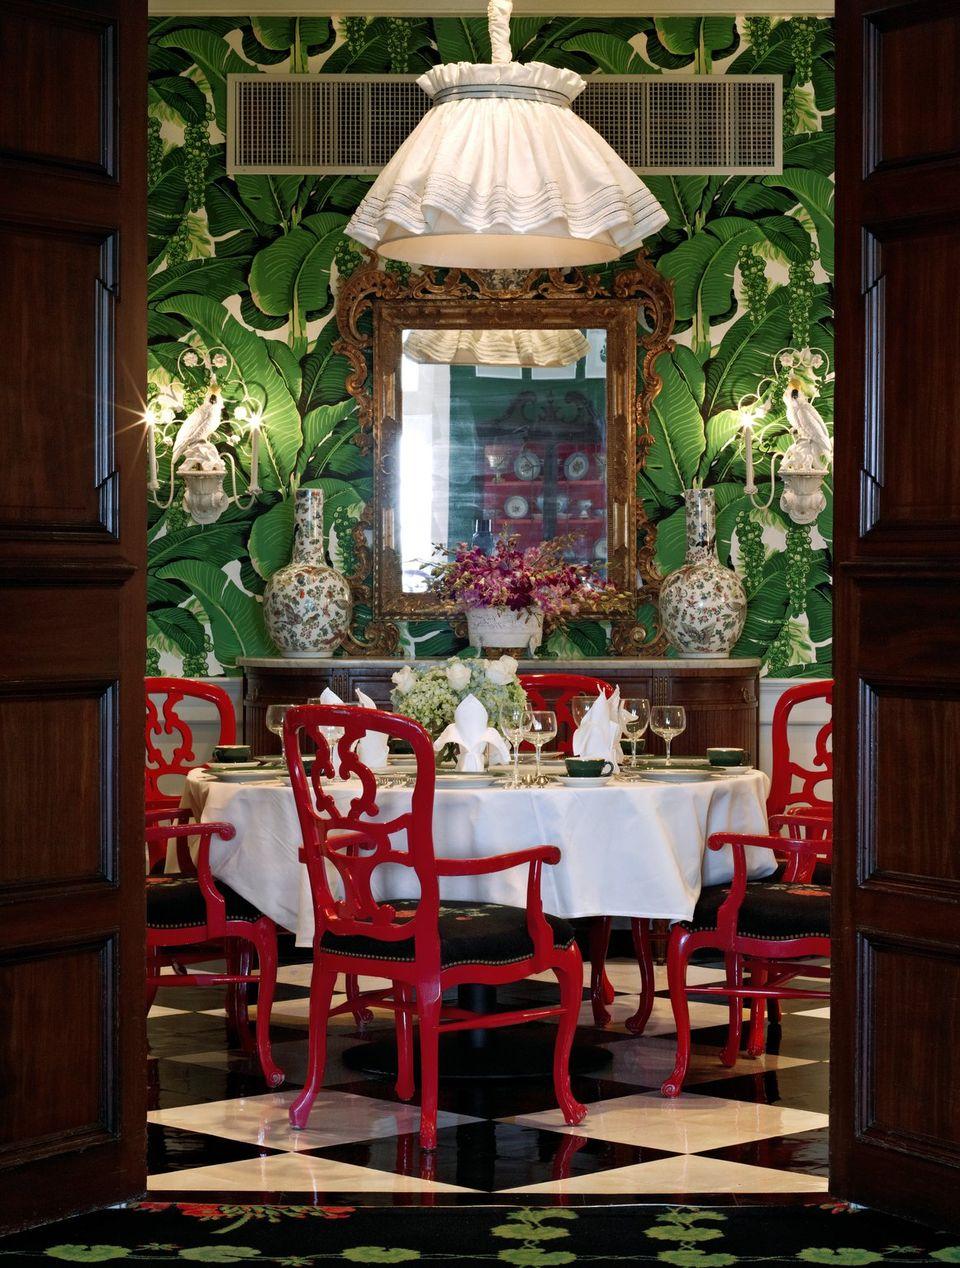 Grand-Hotel-Brazilliance-wallcovering-jpg-%C3%97-wallpaper-wp4606412